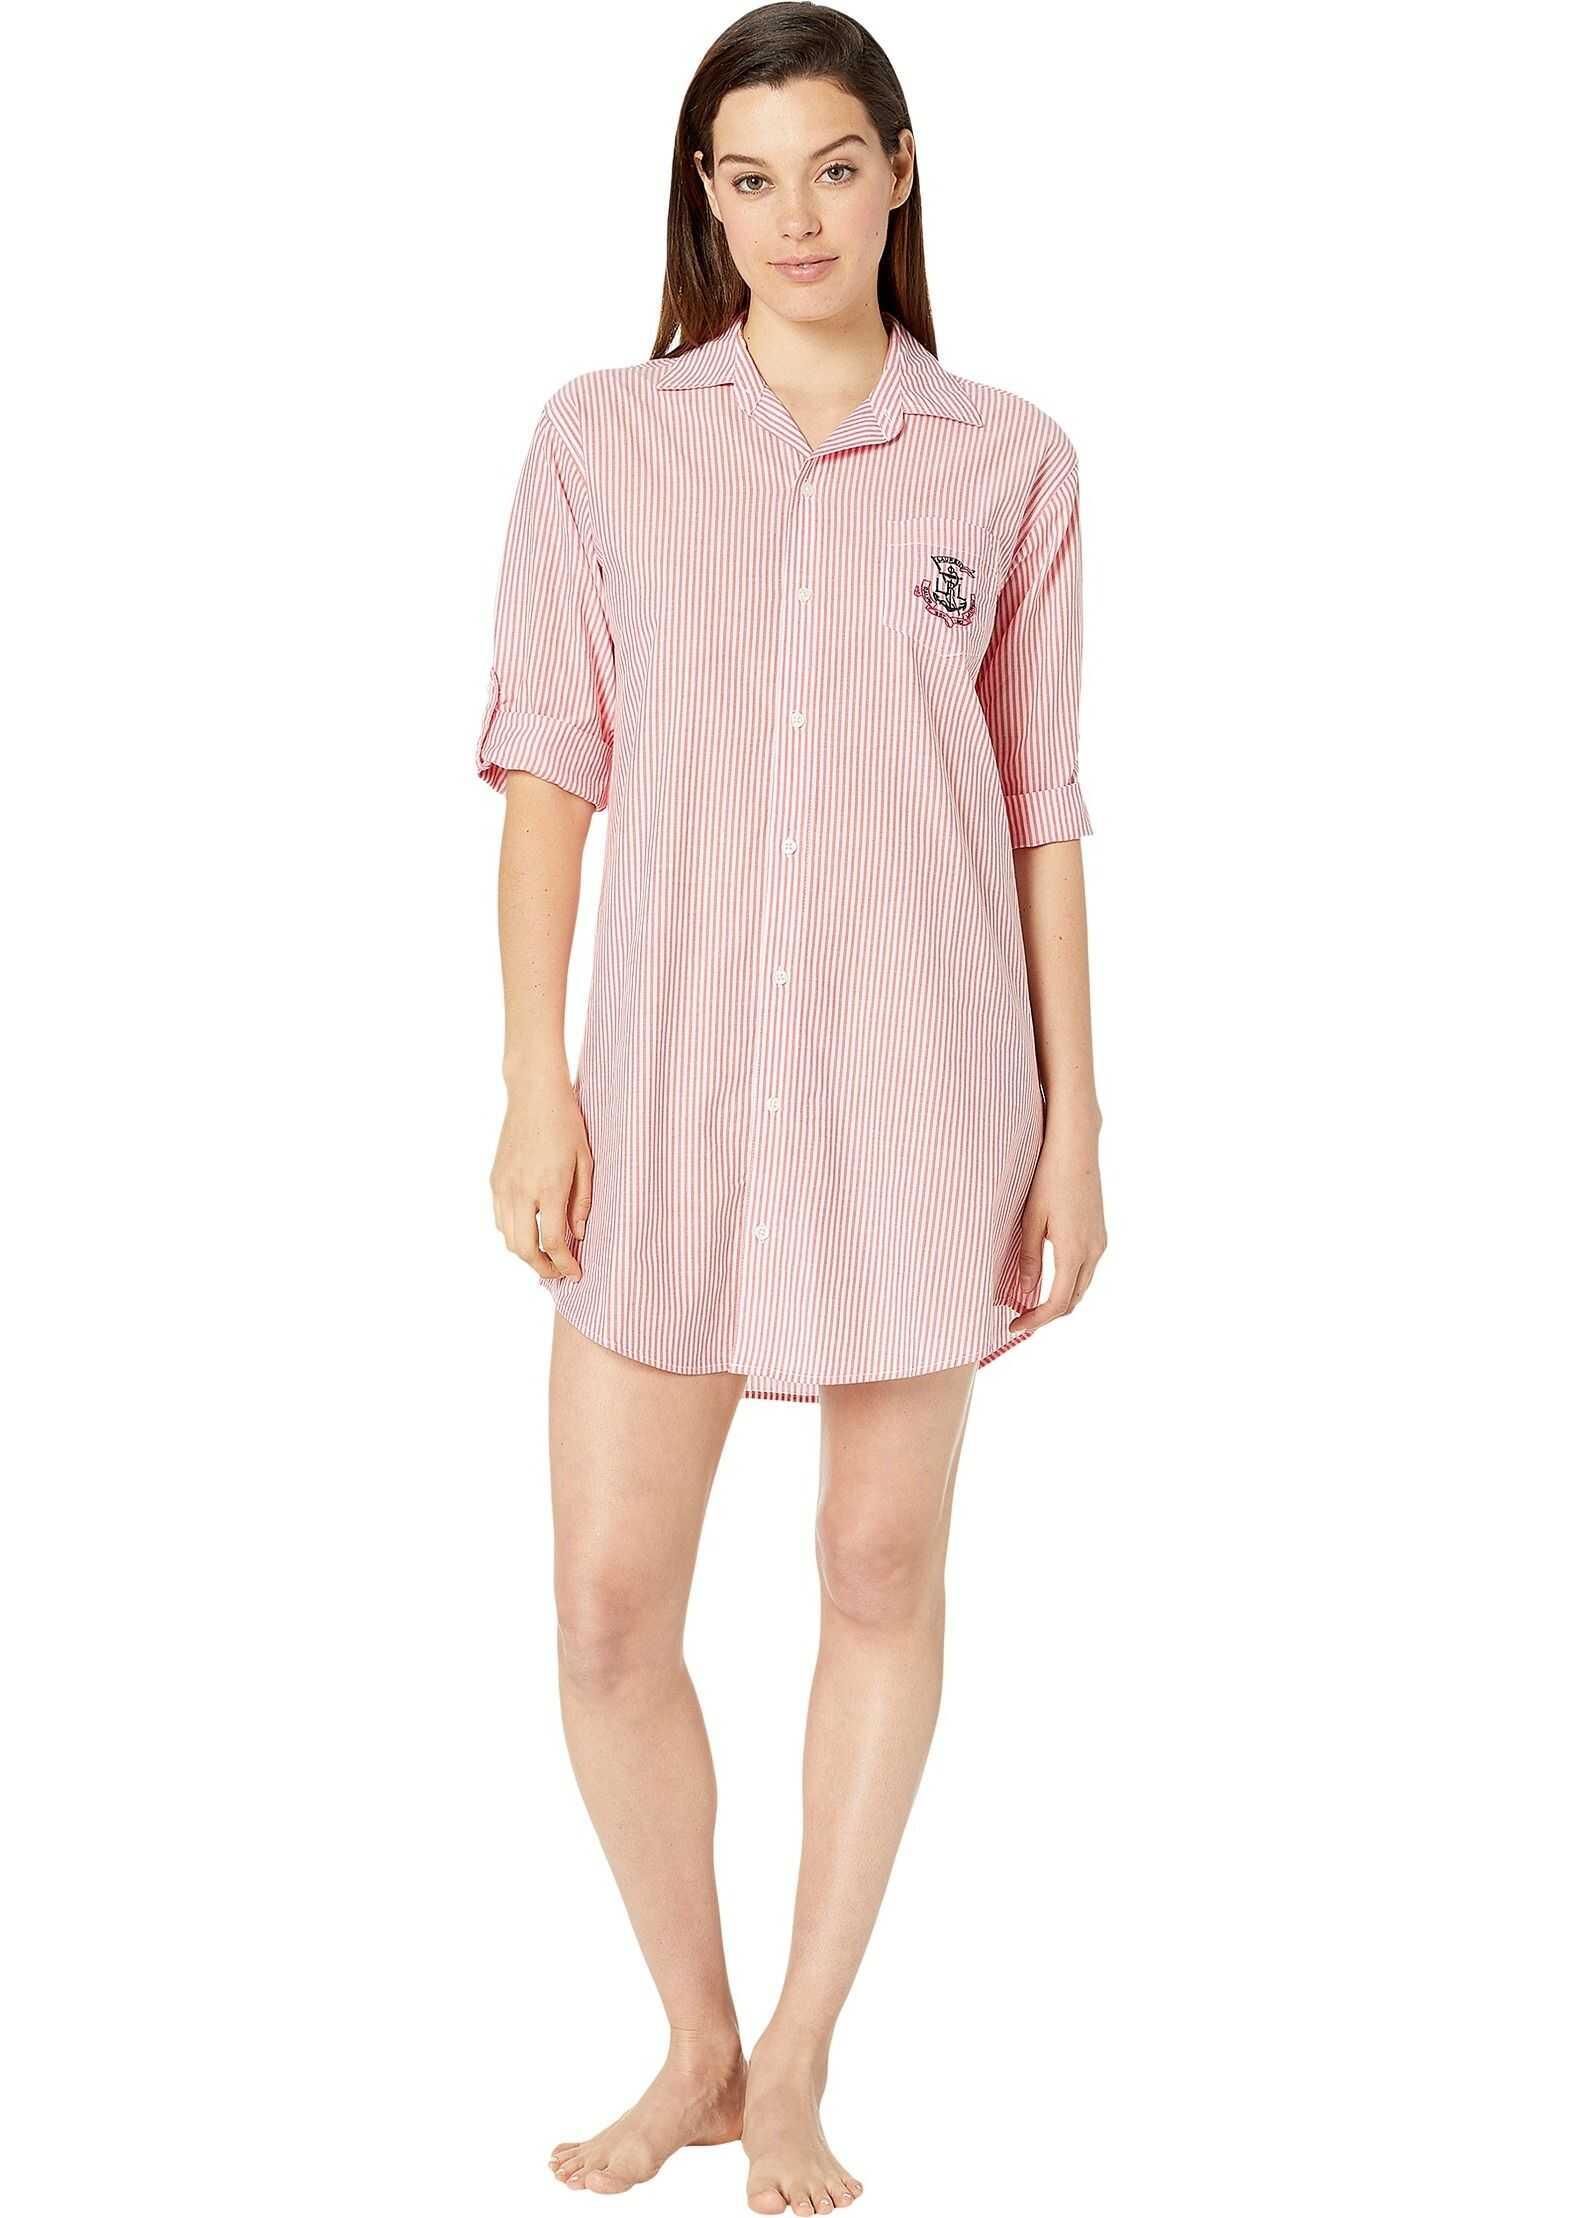 Ralph Lauren 3/4 Sleeve Roll Tab Sleeve His Shirt Sleepshirt Red Stripe